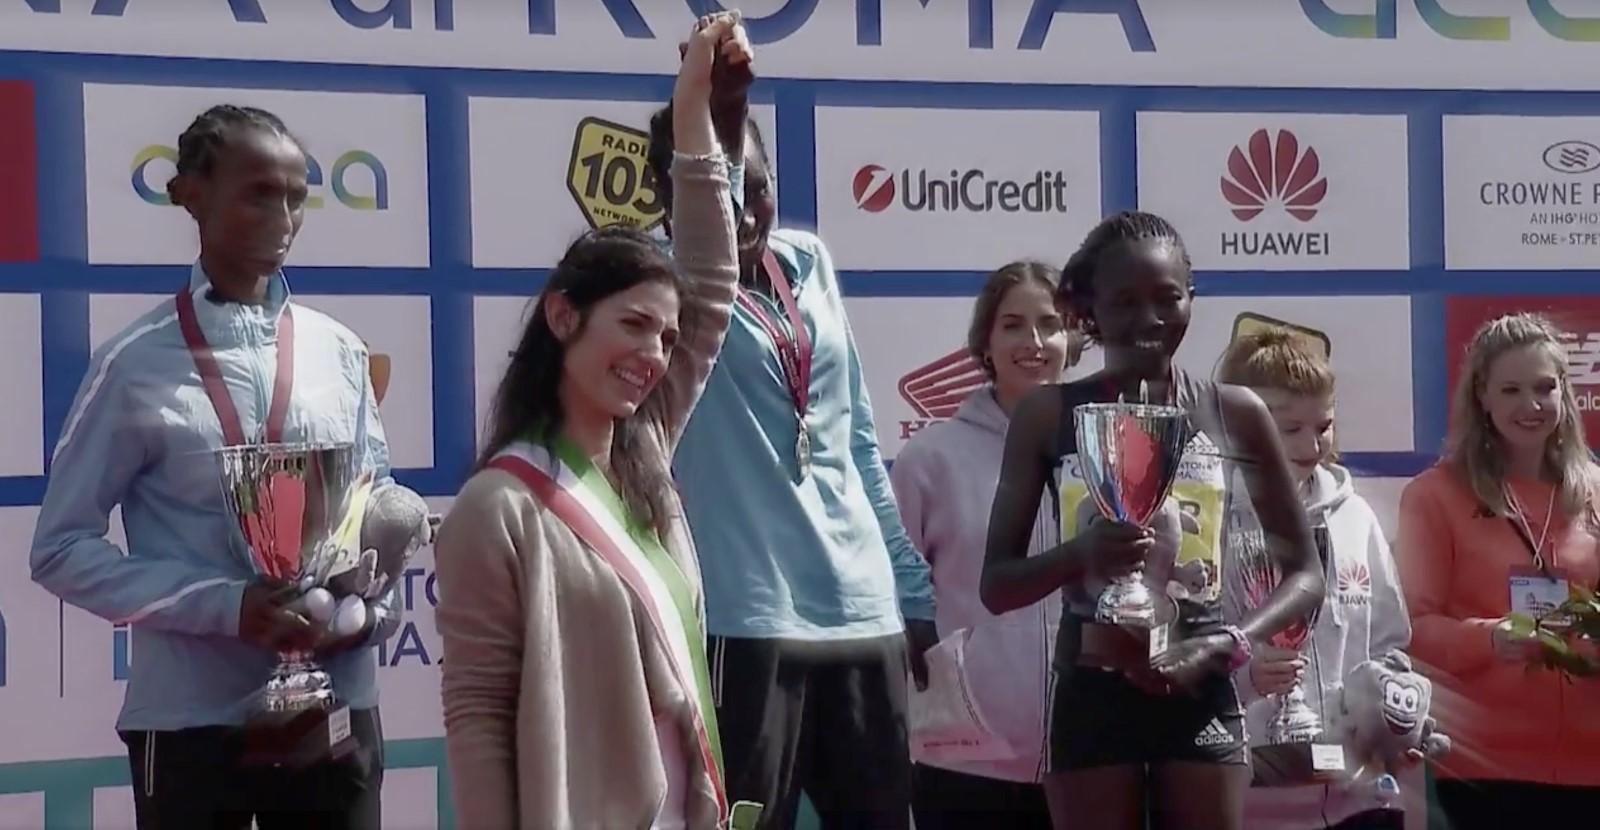 [Хабра-оффтоп] Maratona di Roma, или первый марафон для ИТ-шника - 23